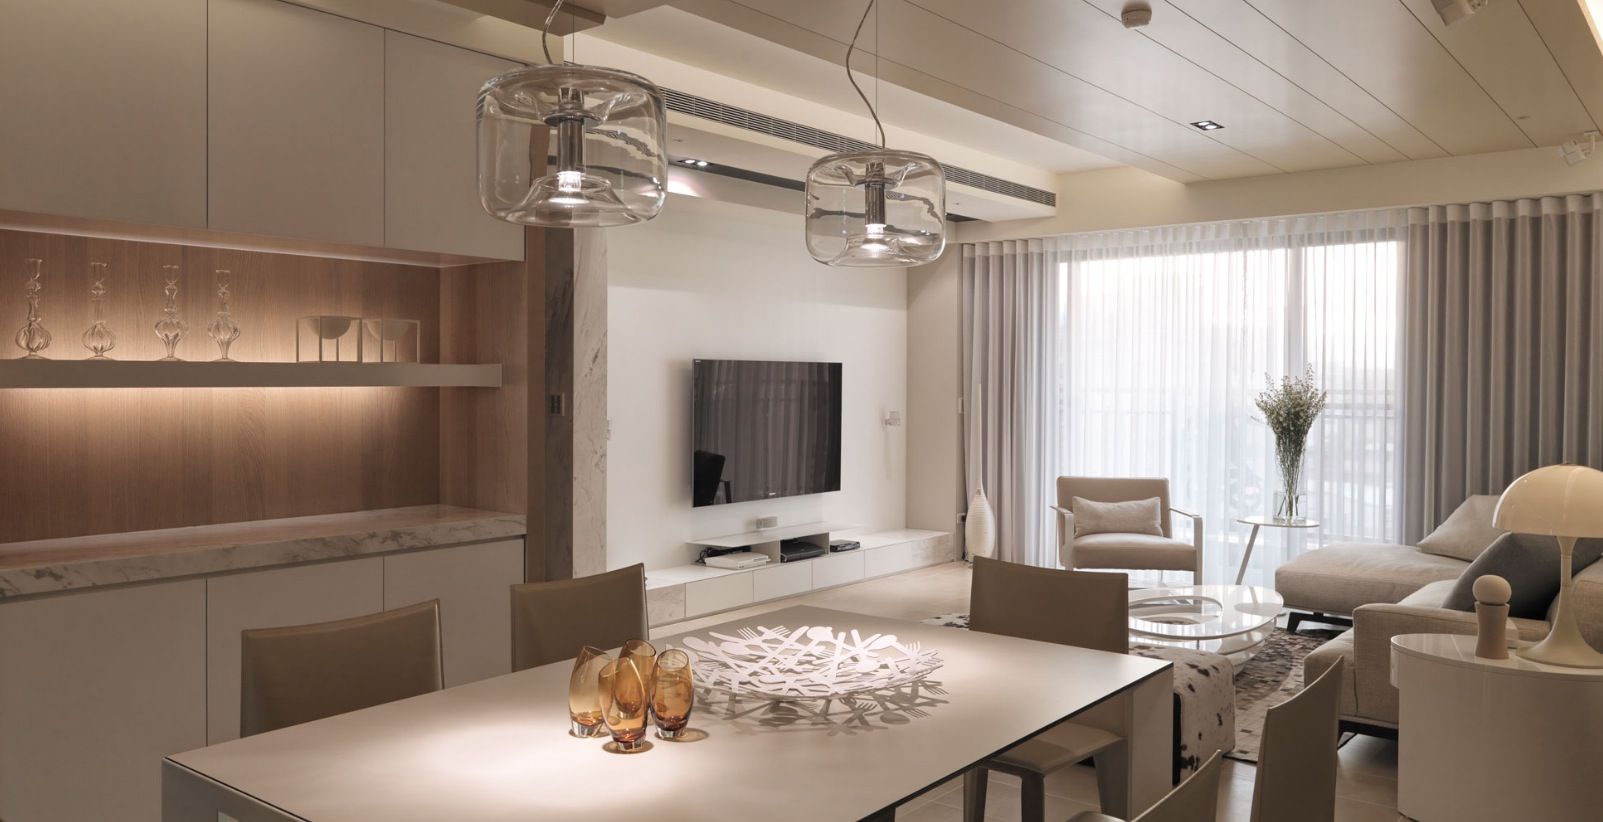 Mini appartamenti di lusso zo65 regardsdefemmes for Interni appartamenti di lusso